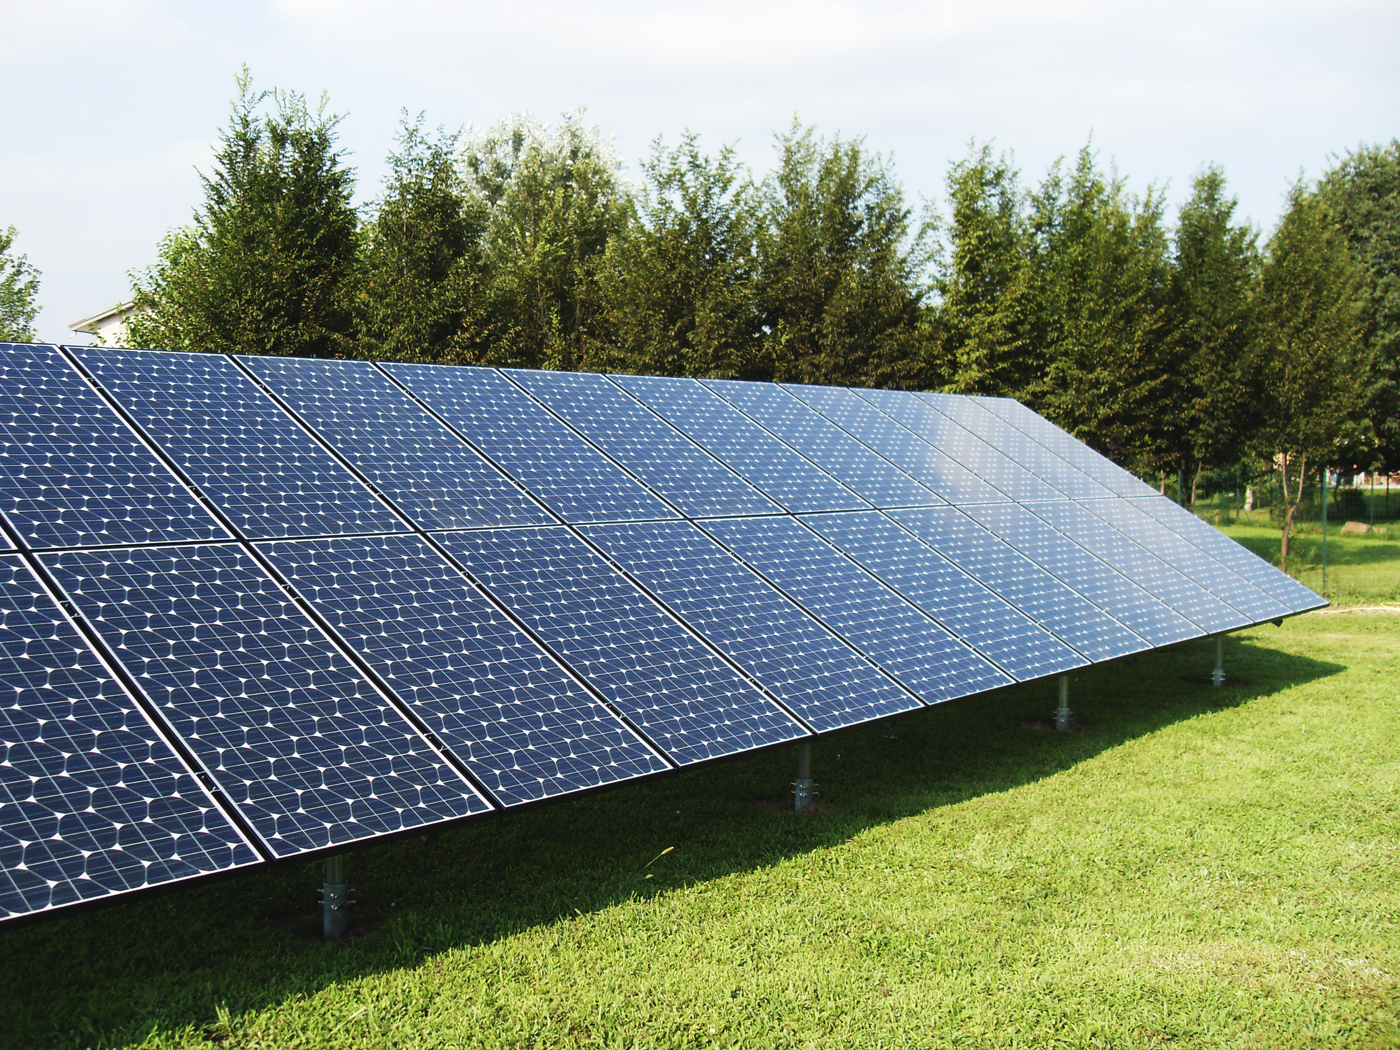 impianti elettrici, fotovoltaici e domotici Udine Friuli Venezia Giulia